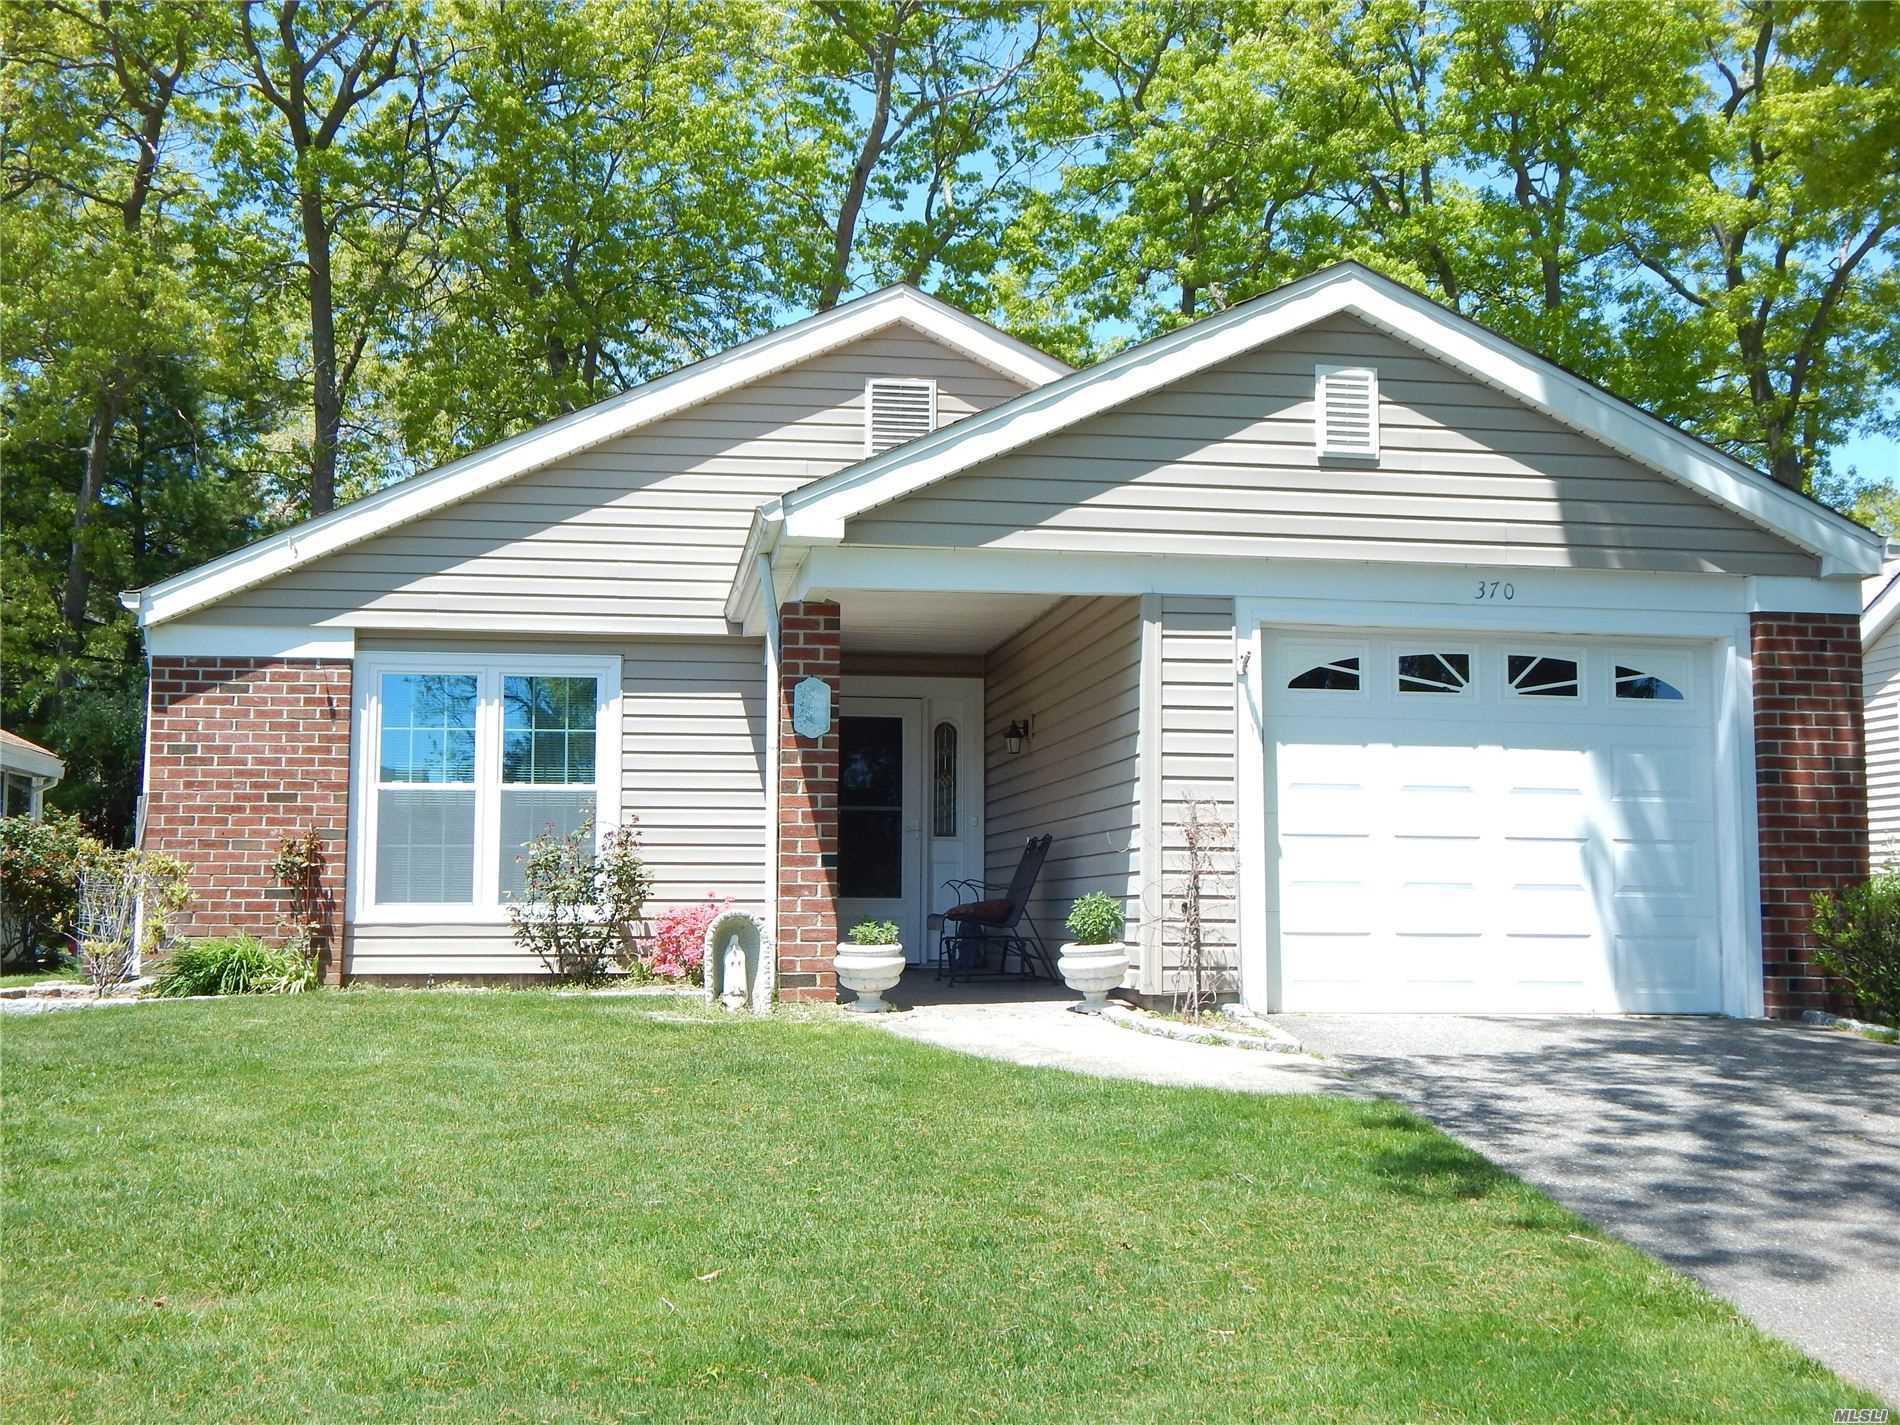 Property for sale at 370 Sheffield Court, Ridge NY 11961, Ridge,  New York 11961